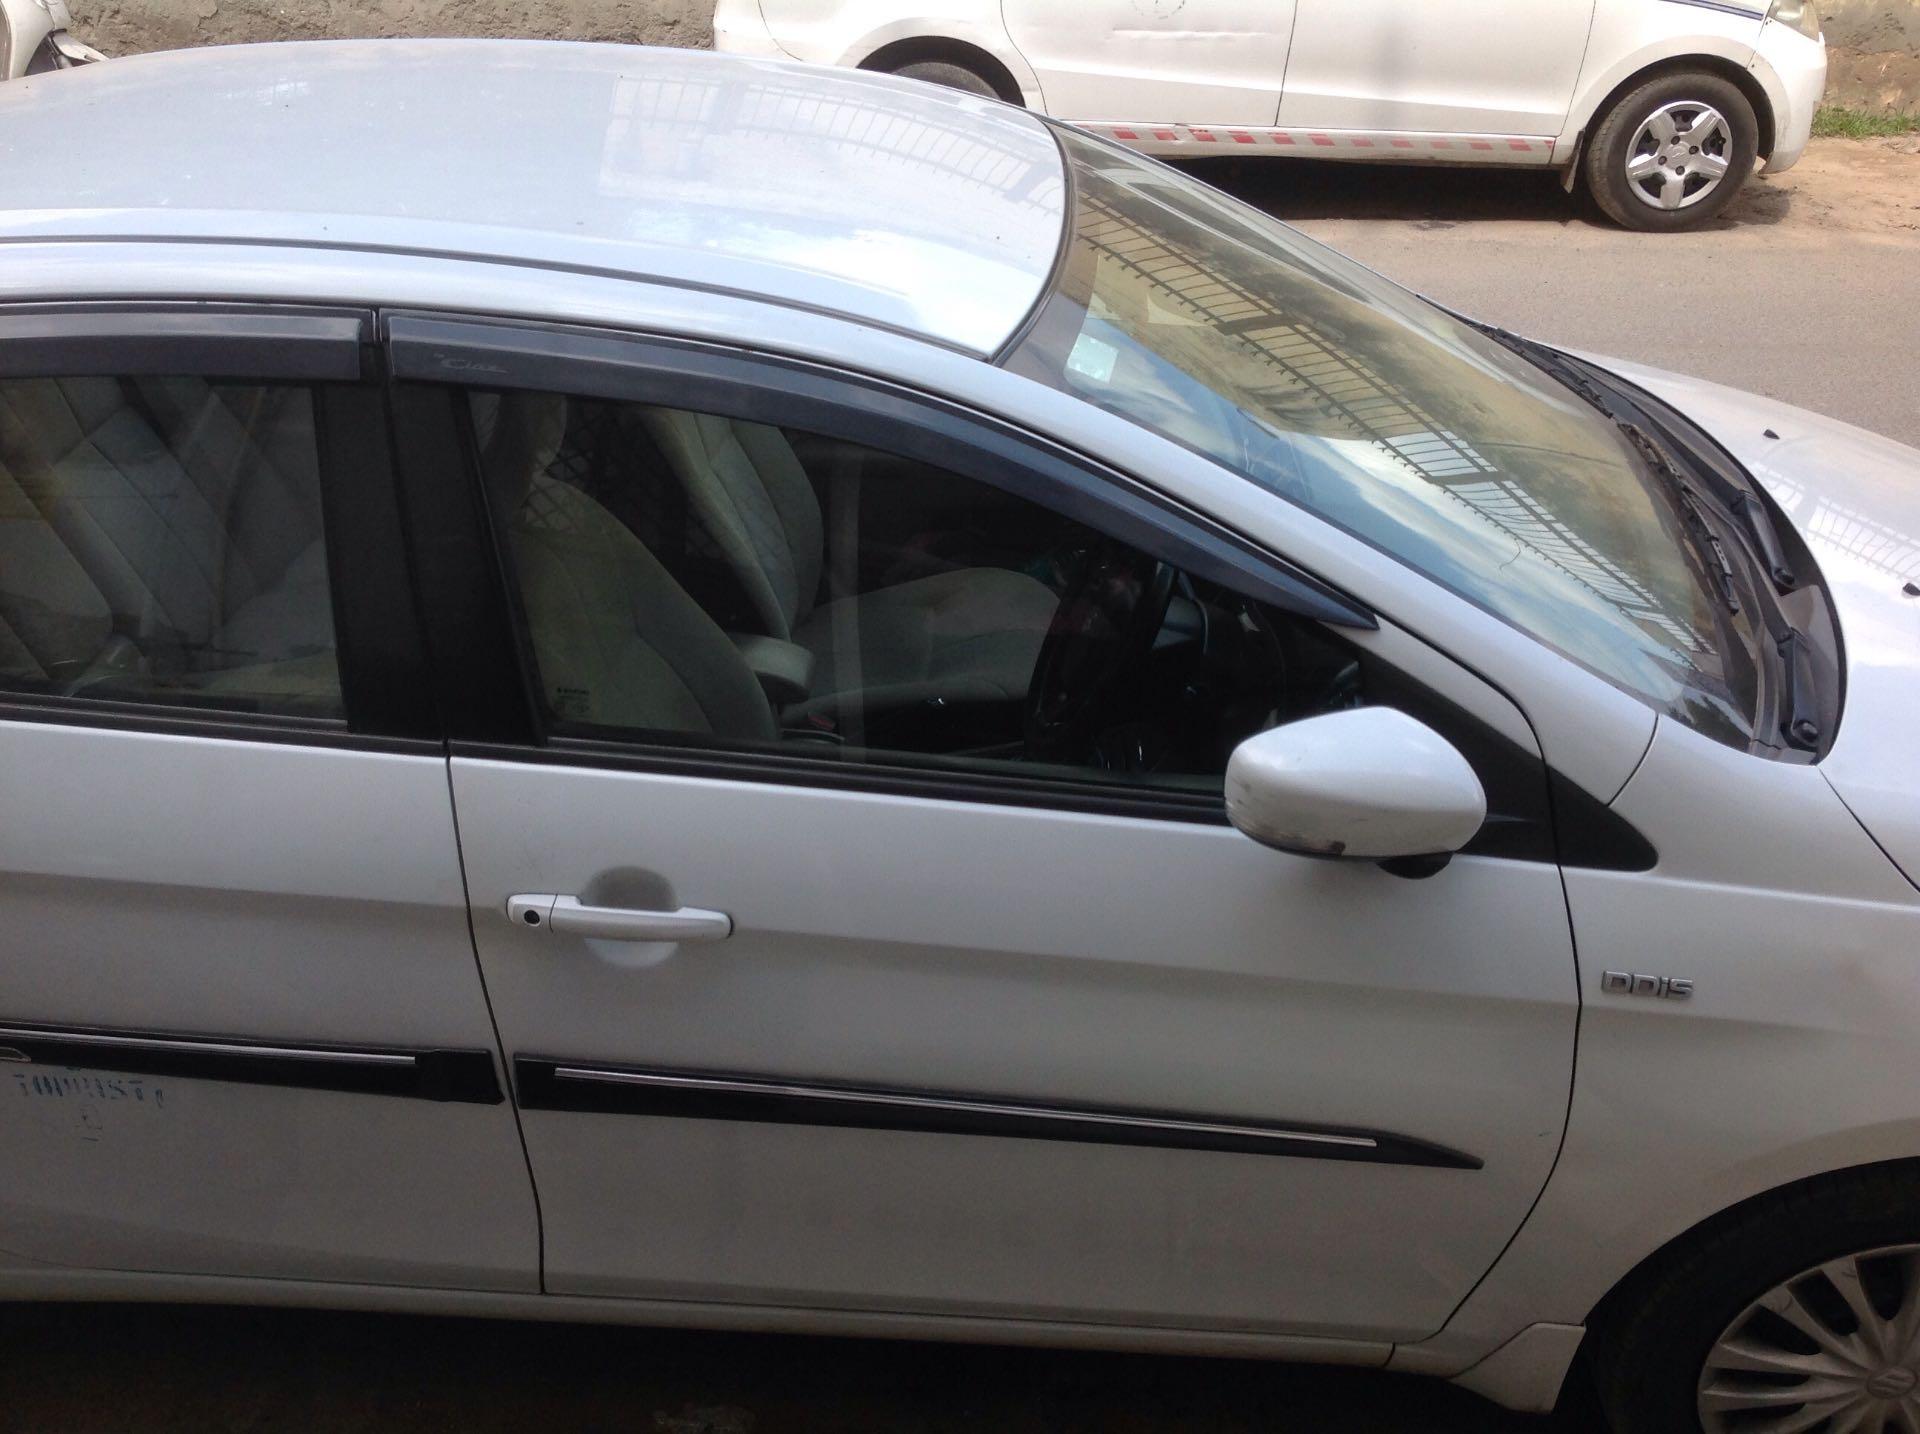 Top Maruti Suzuki Zen Car Hire For Outstation In Rajokri Best